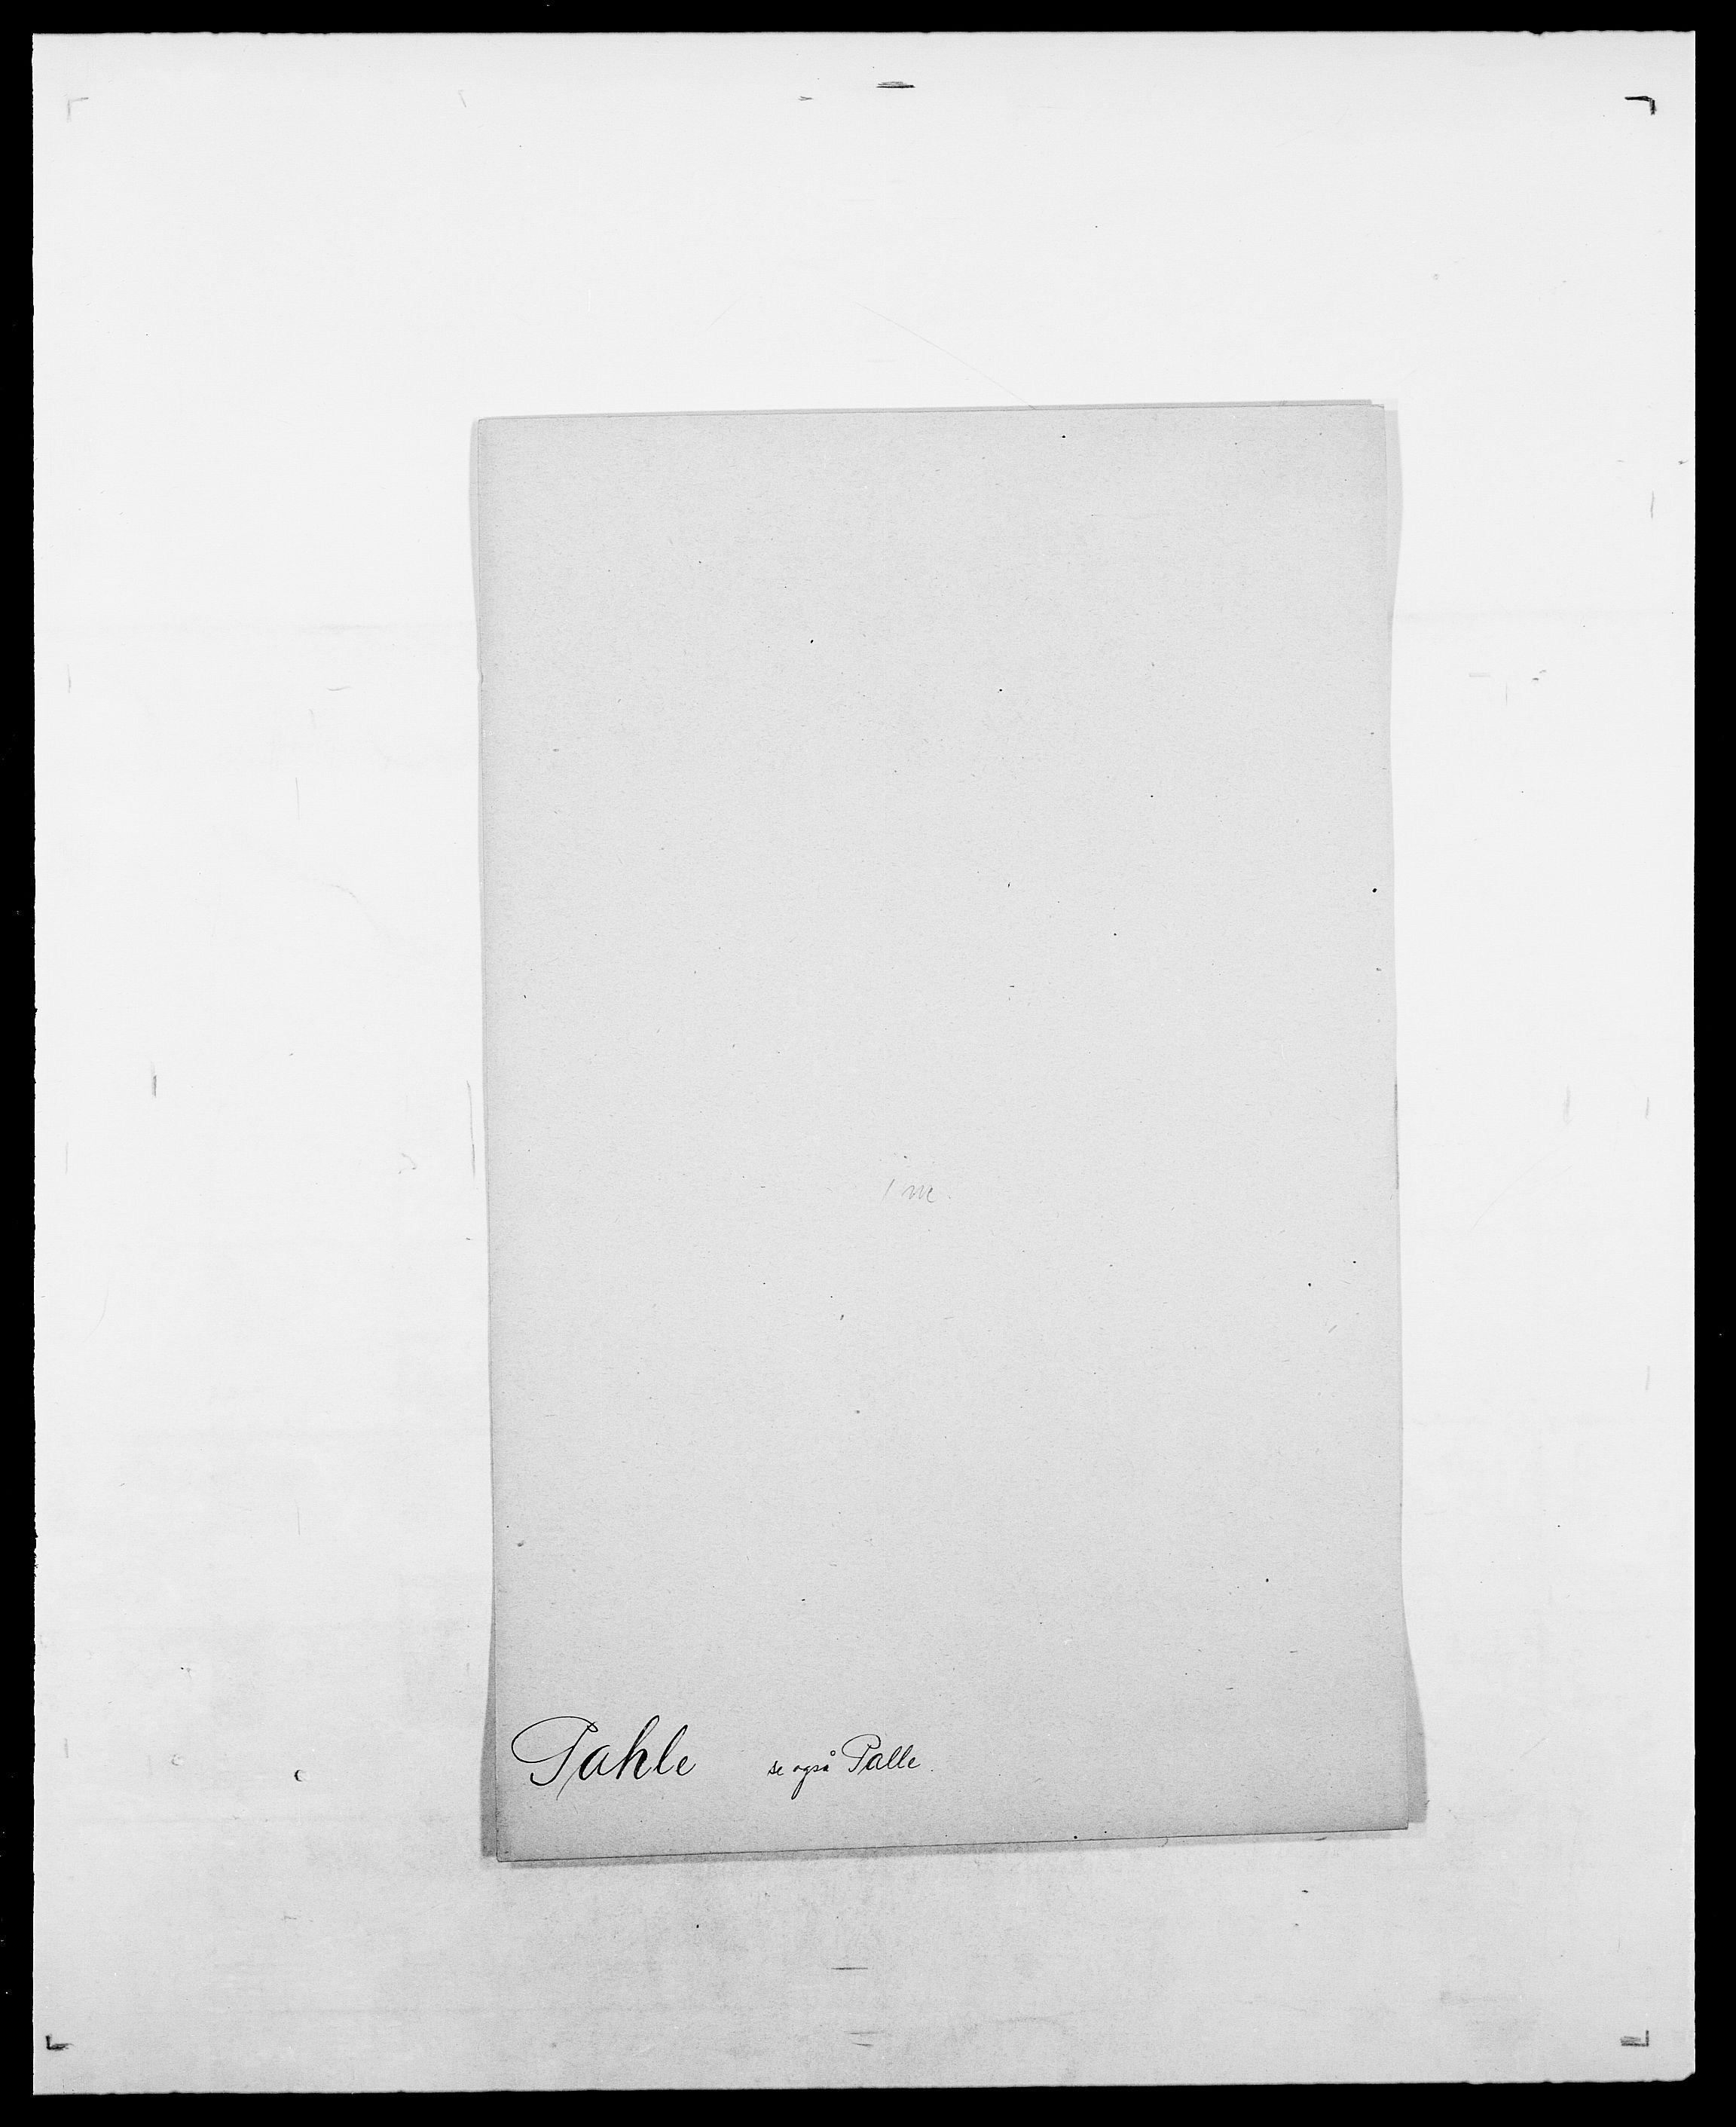 SAO, Delgobe, Charles Antoine - samling, D/Da/L0030: Paars - Pittelkov, s. 58